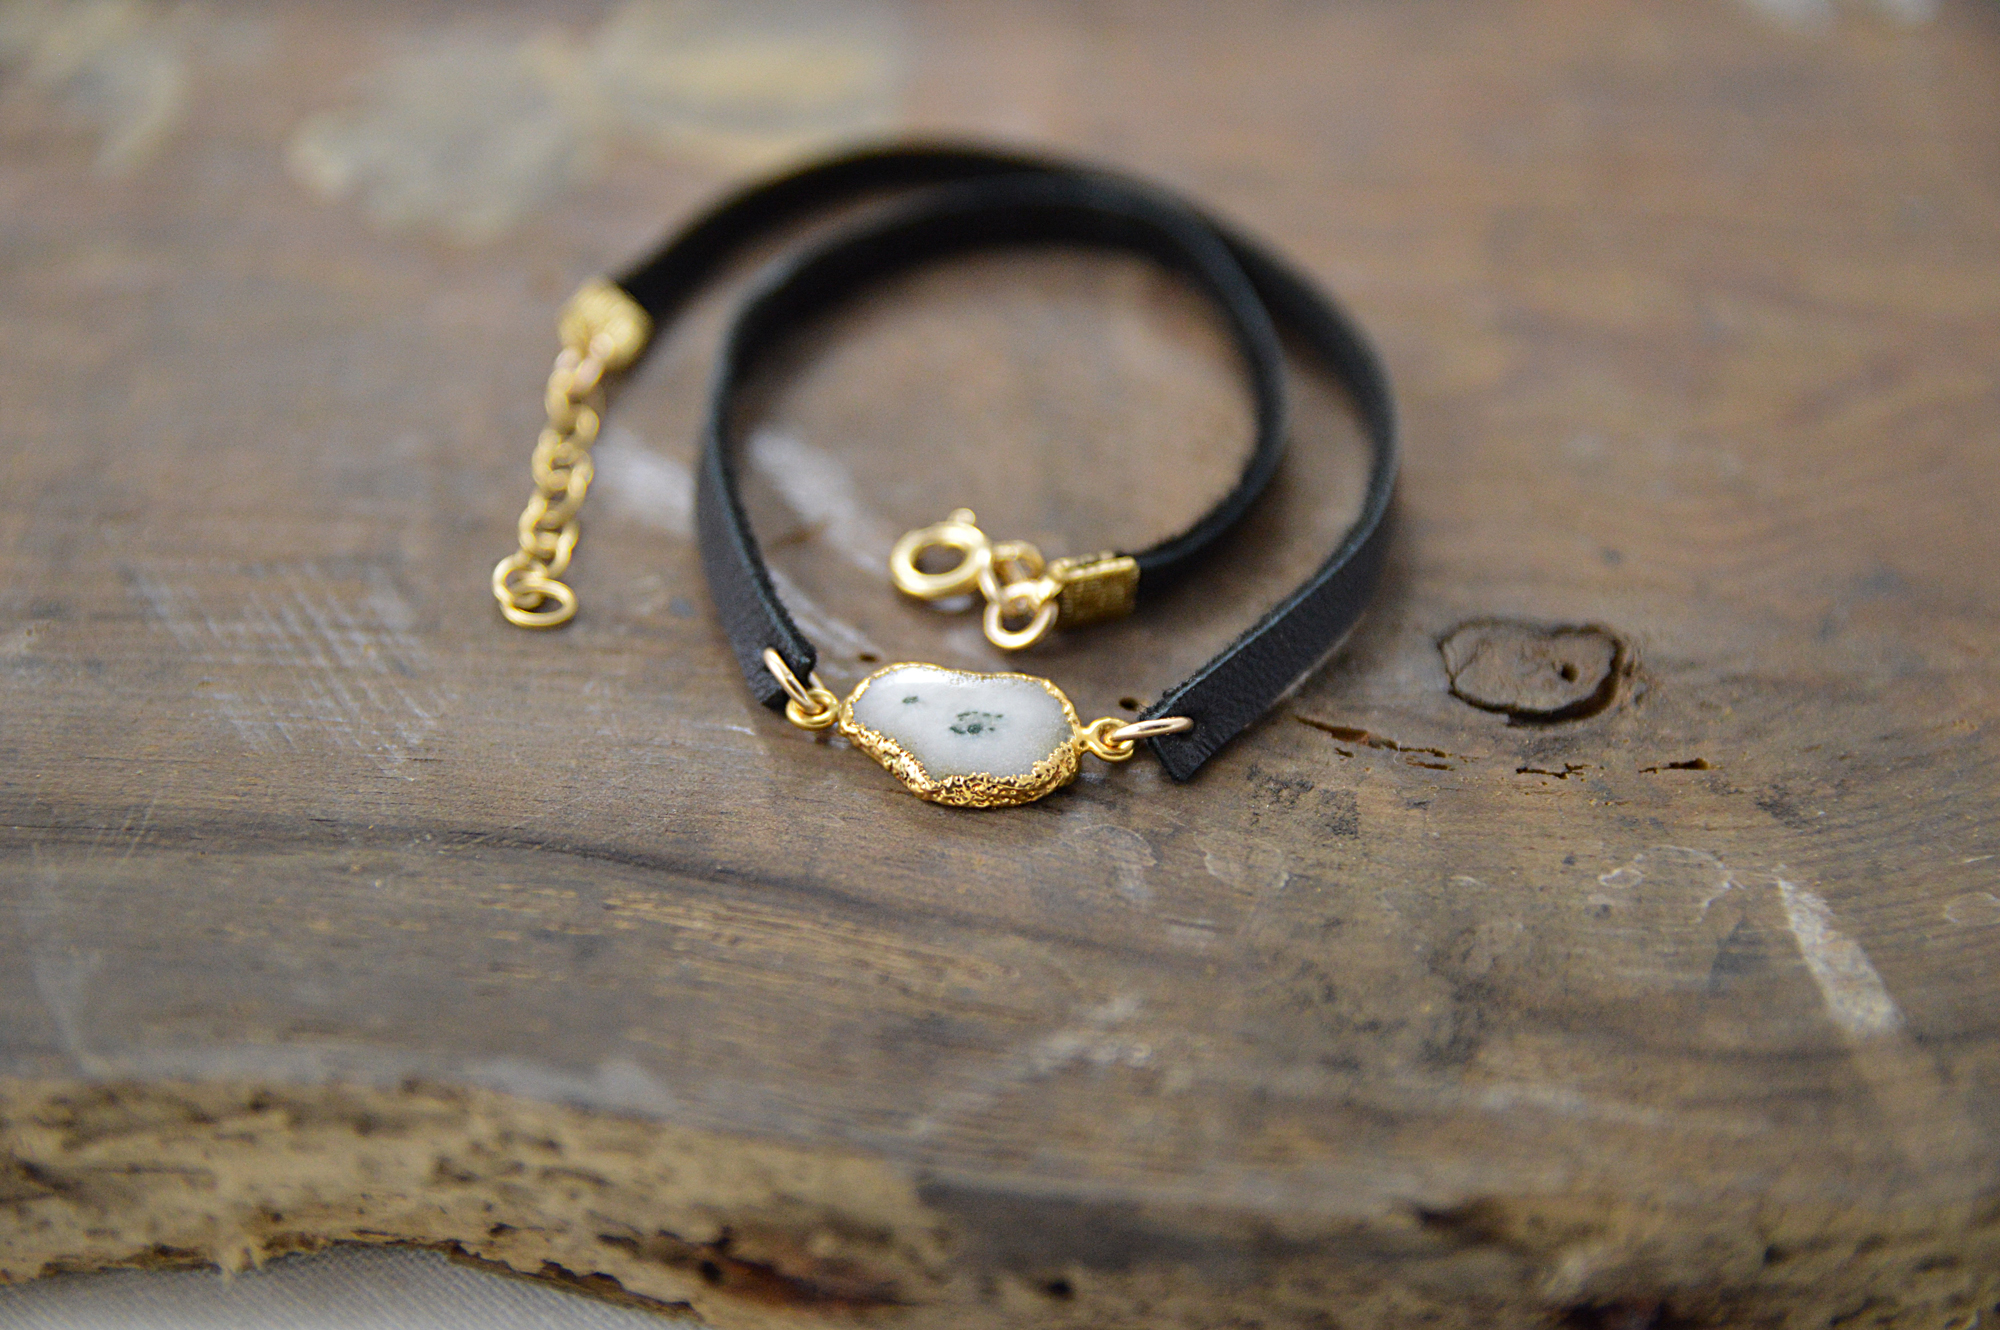 solar quartz leather bracelet choker made in buffalo ny gift shop